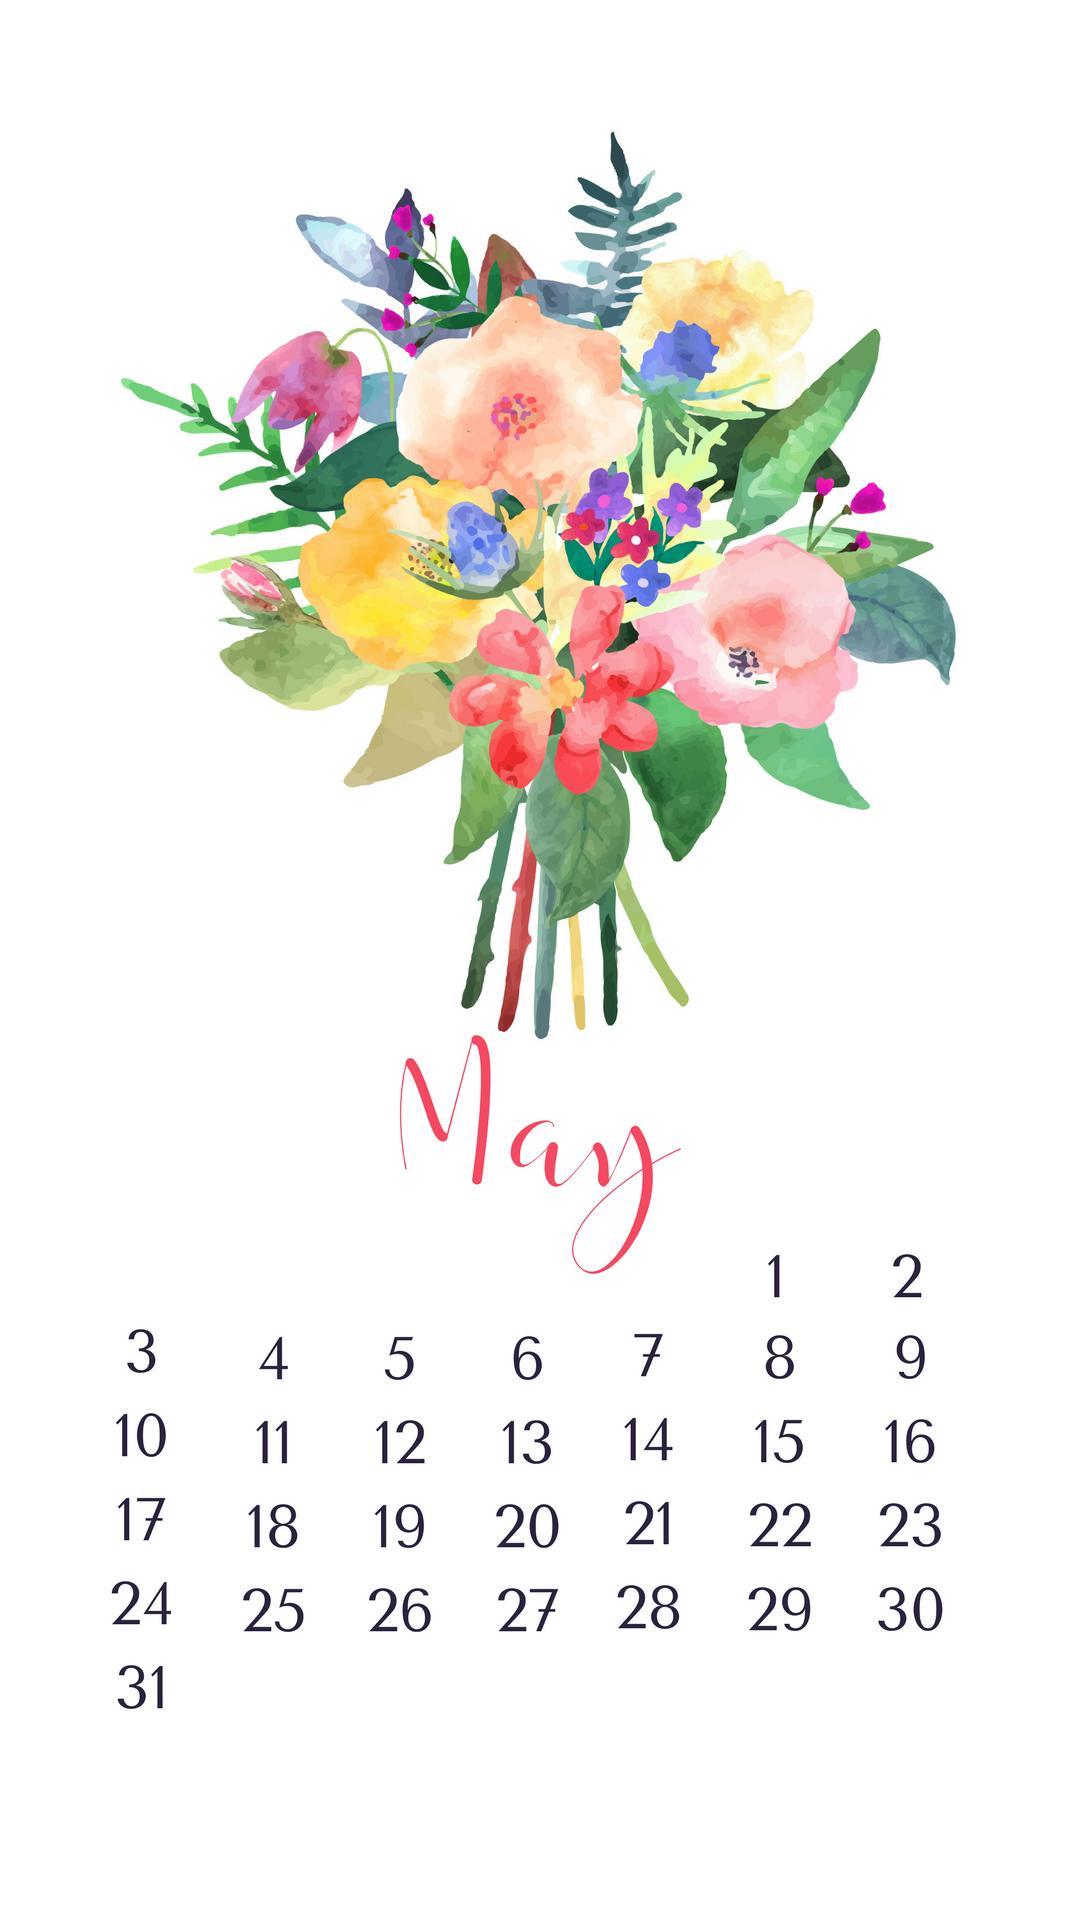 iPhone May 2020 Calendar Wallpaper - Free 2020 Printable Calendar| Blank Templates| 2020 Holidays